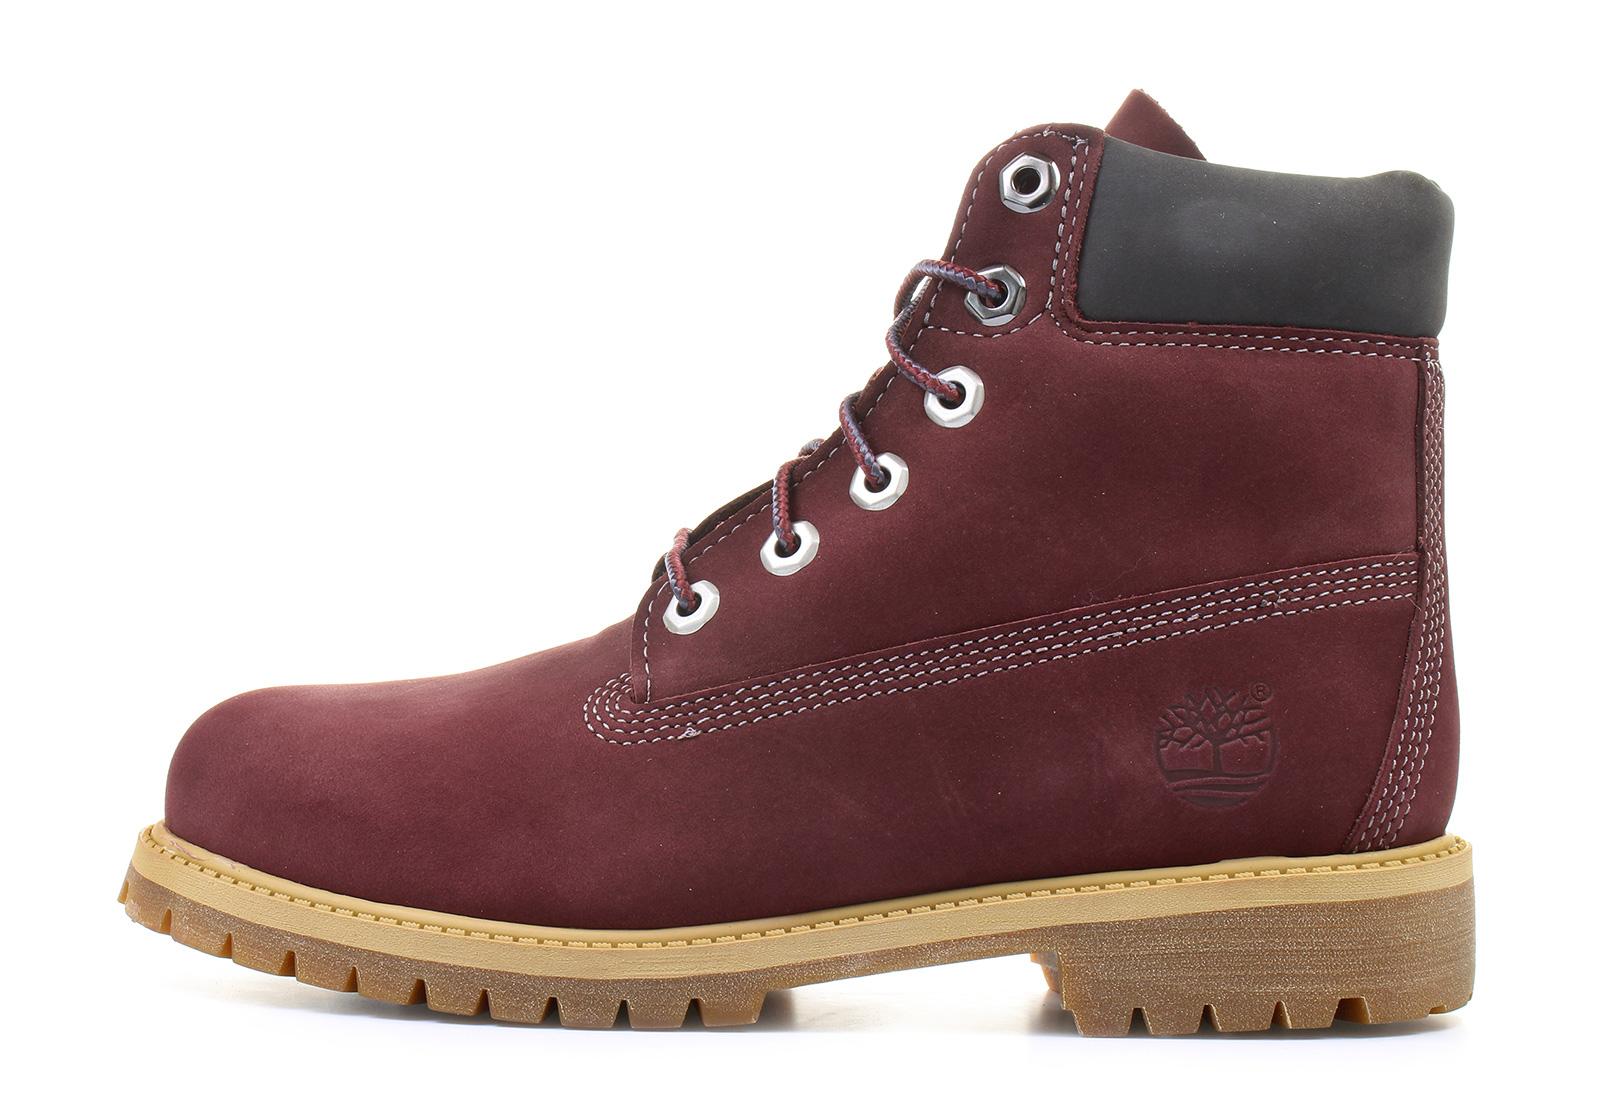 timberland boots 6 inch premium boot a1baq por. Black Bedroom Furniture Sets. Home Design Ideas